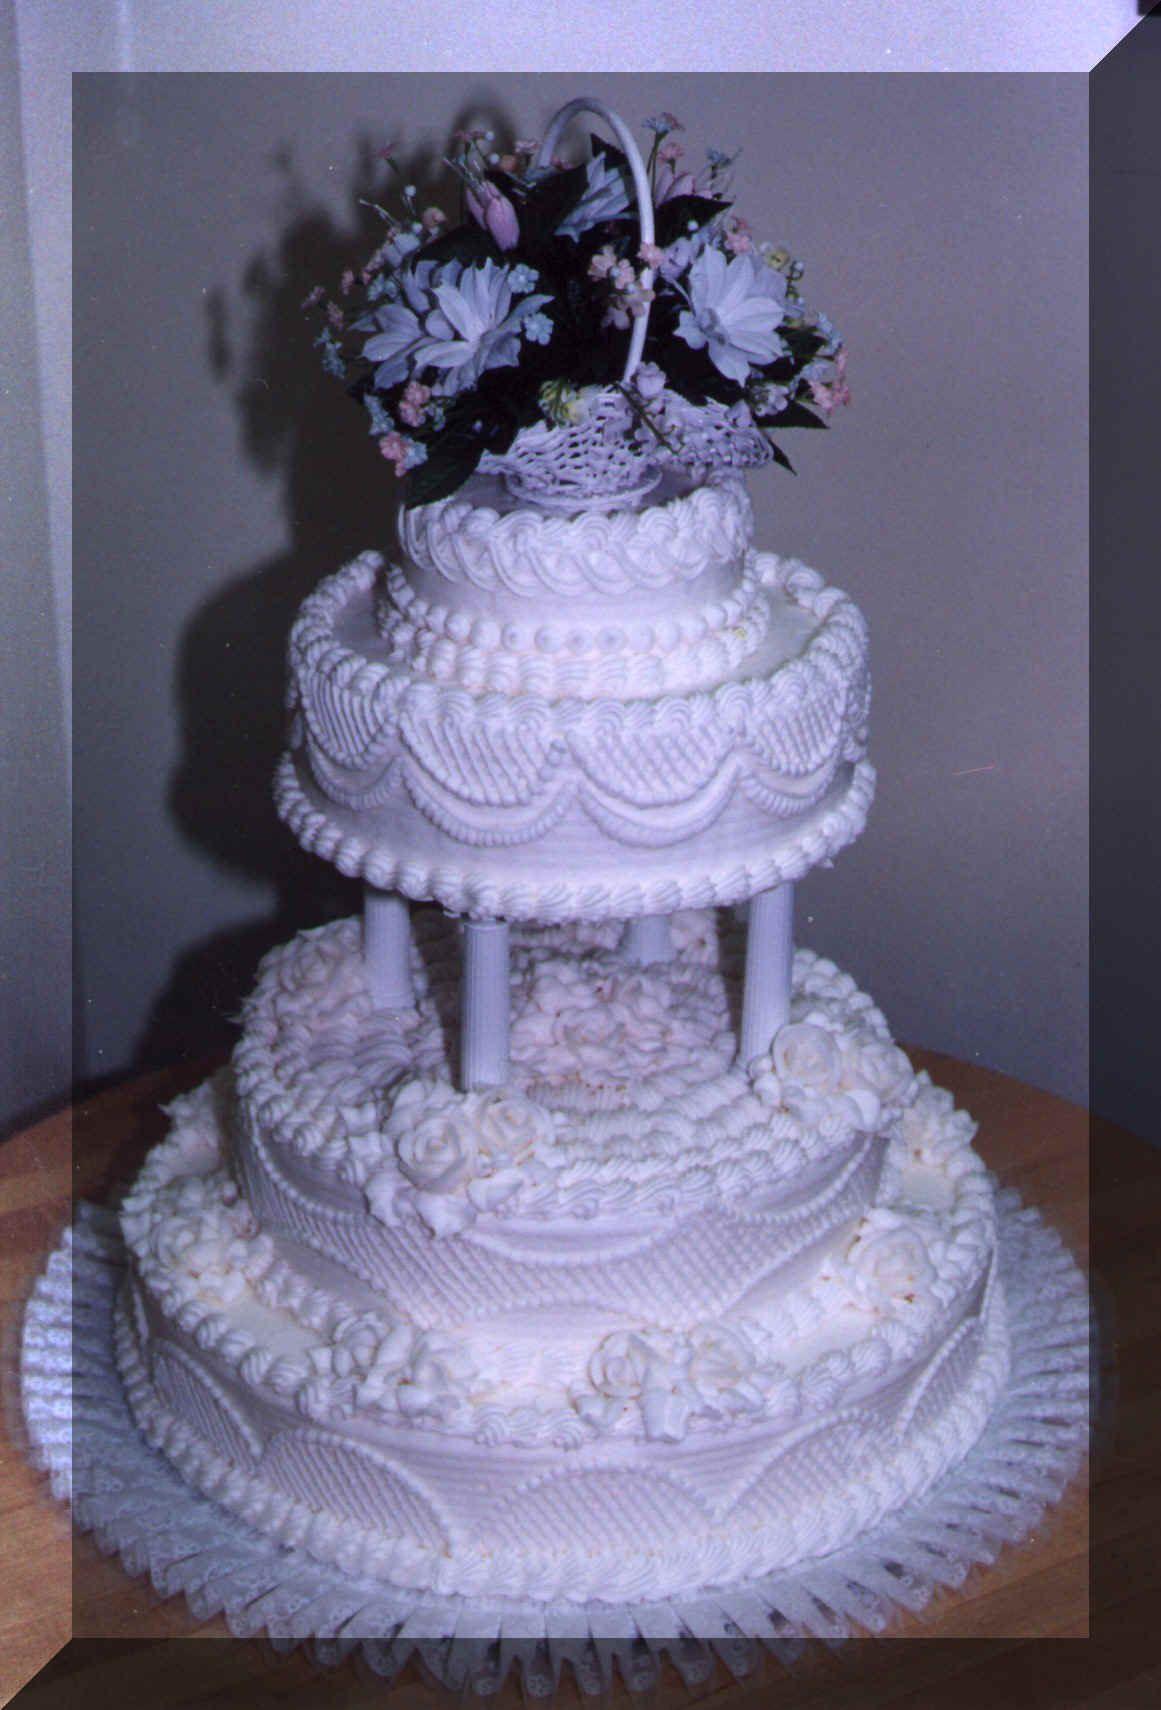 Walmart Wedding Cakes Price List  Walmart Wedding Cakes Prices